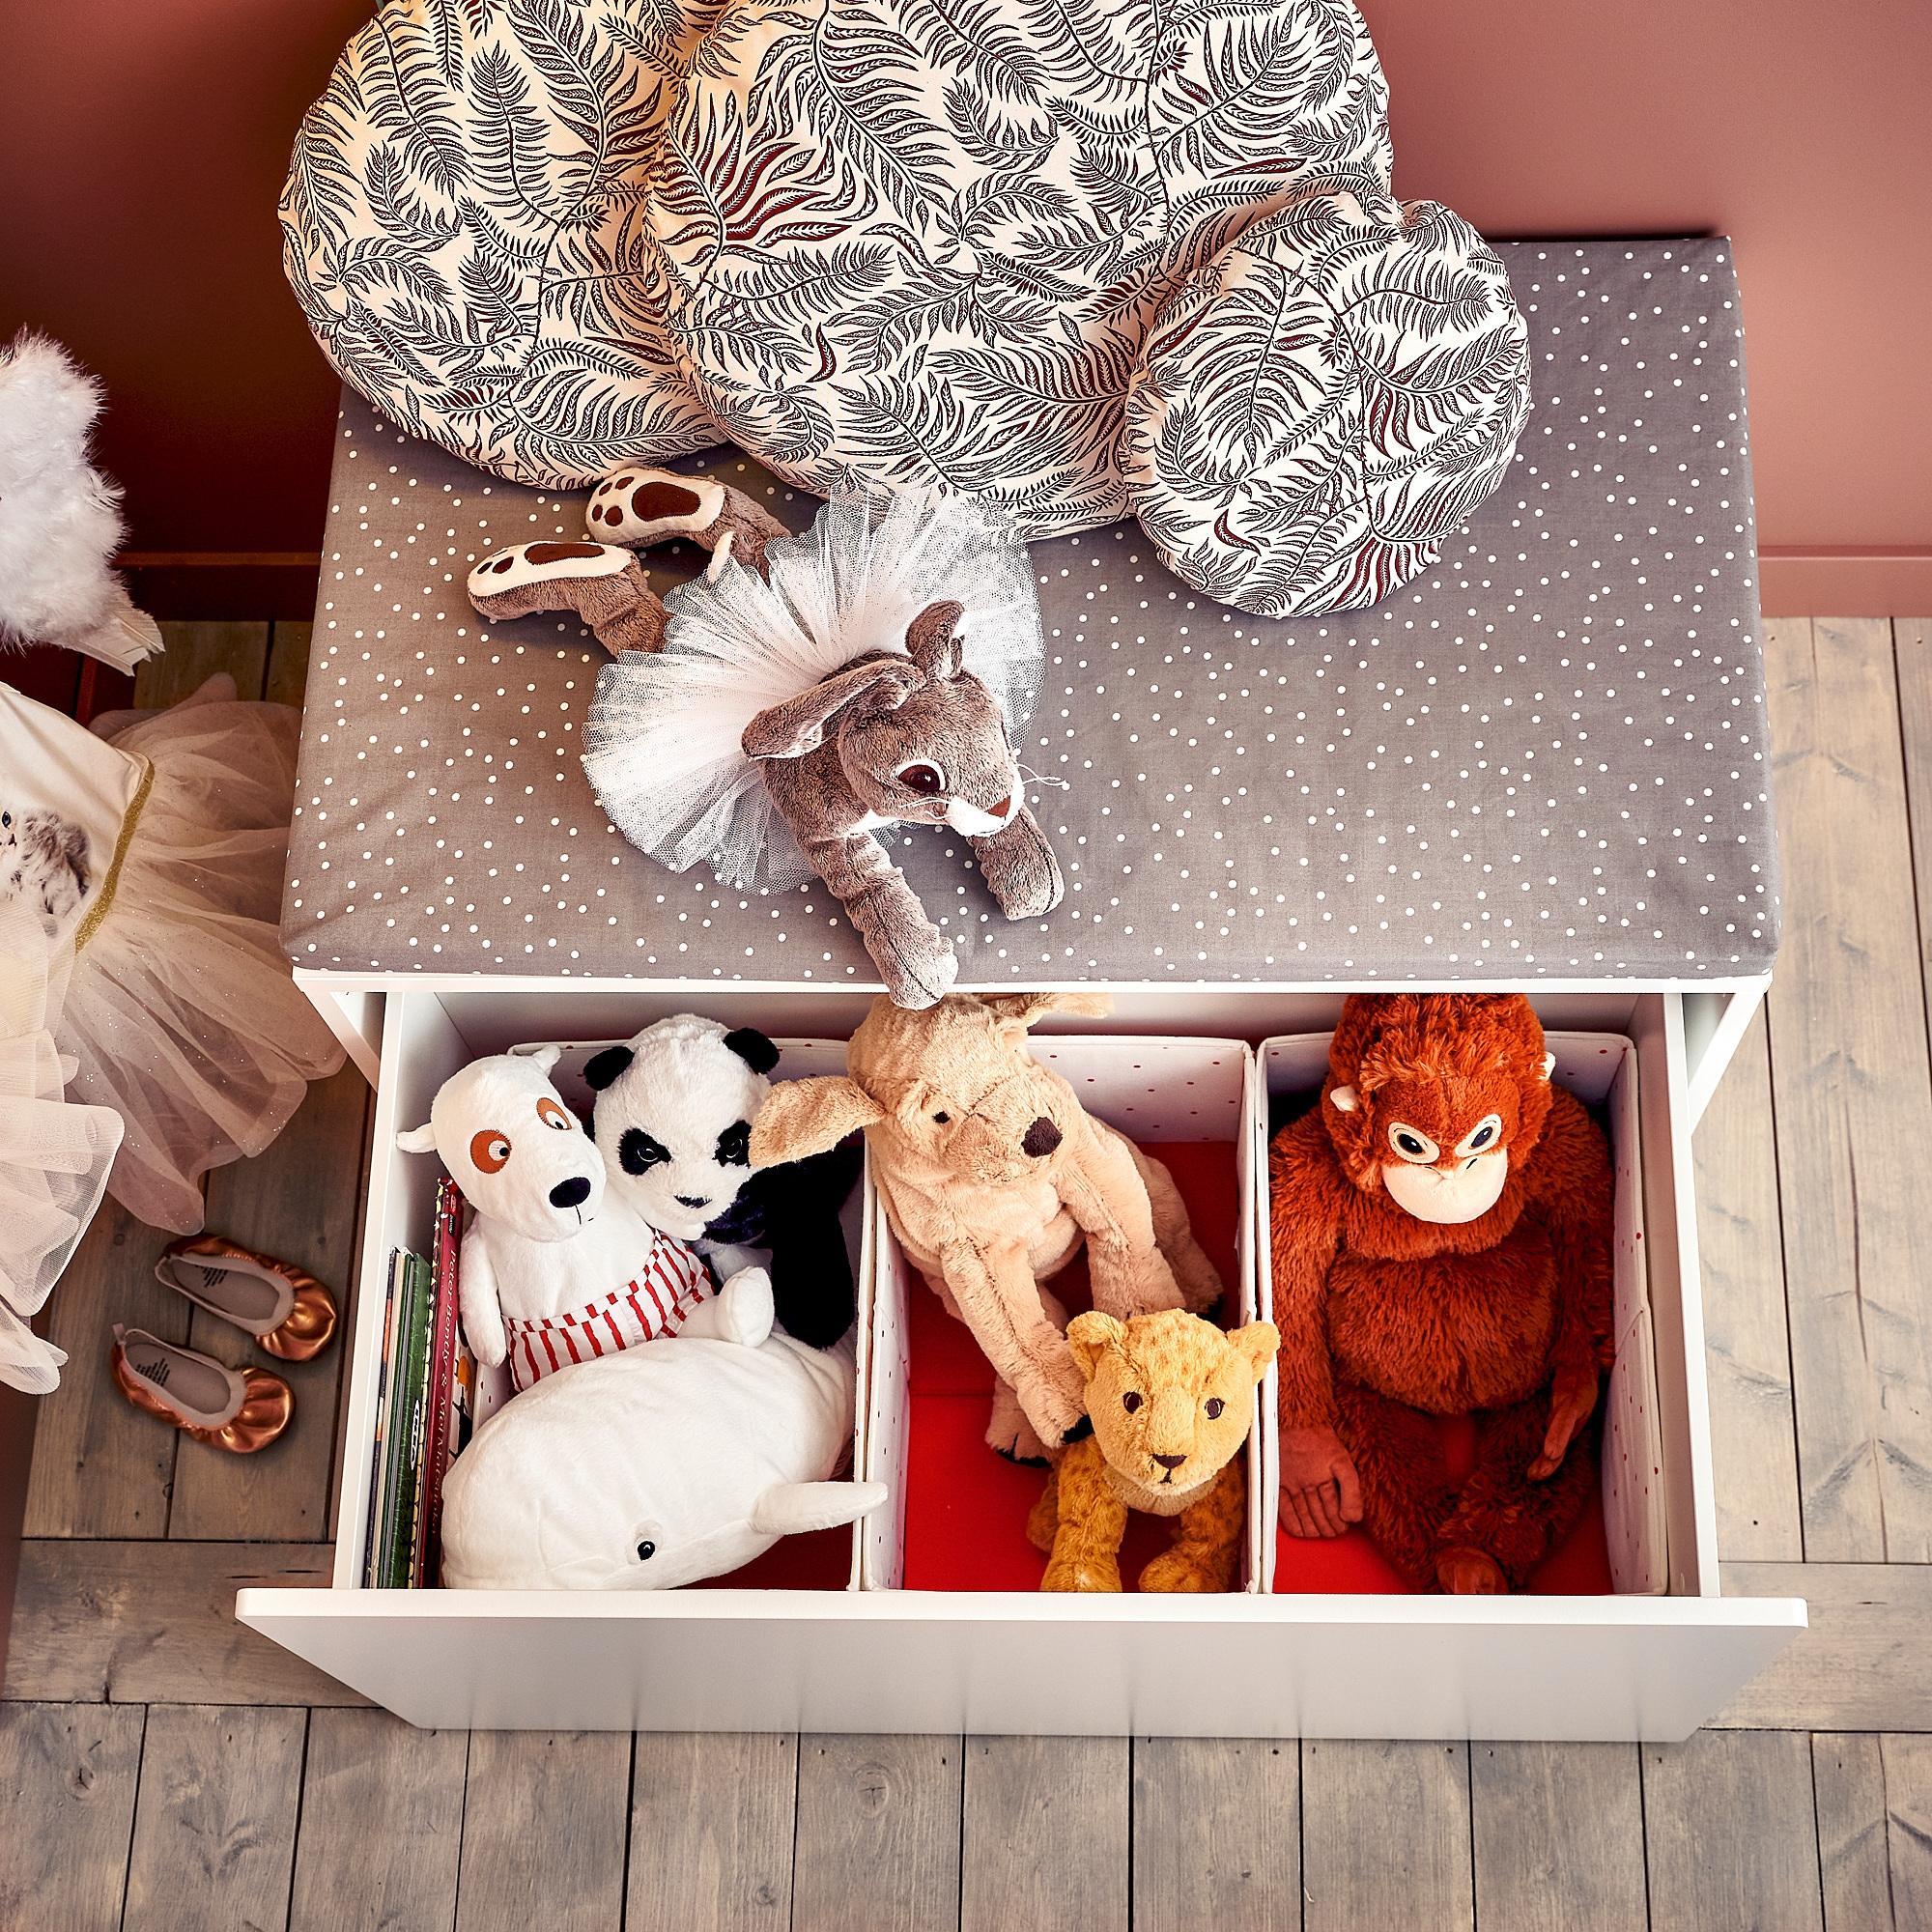 SMÅSTAD Benk med lekeoppbevaring hvitlys turkis IKEA